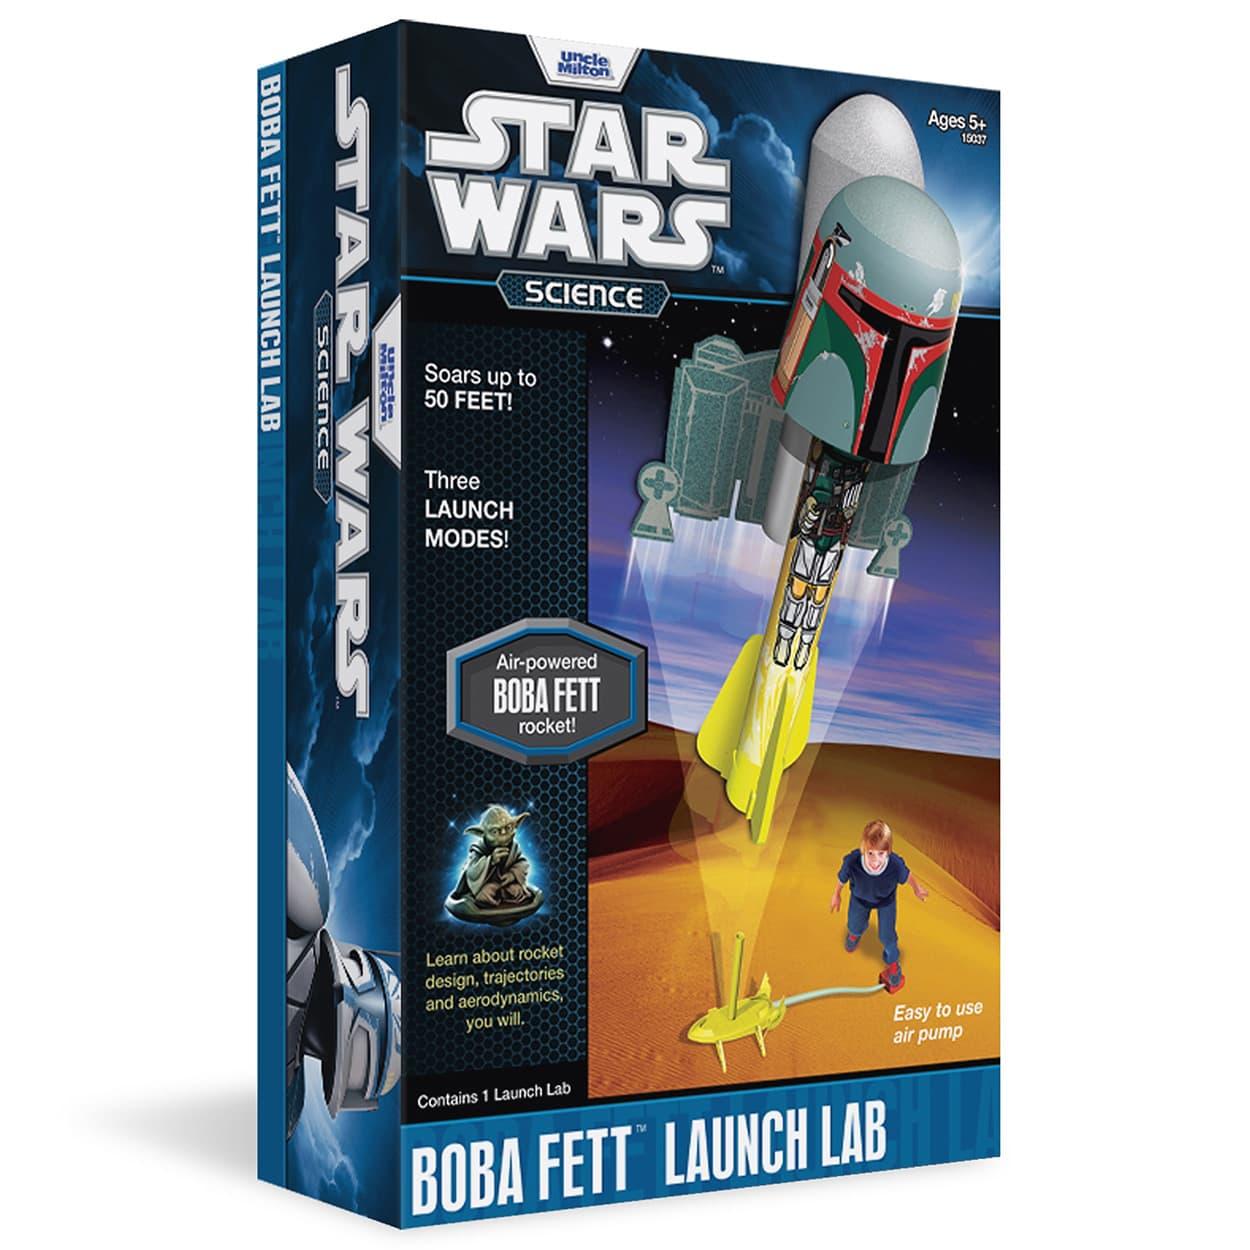 Star Wars Science Boba Fett Launch Lab (2011)